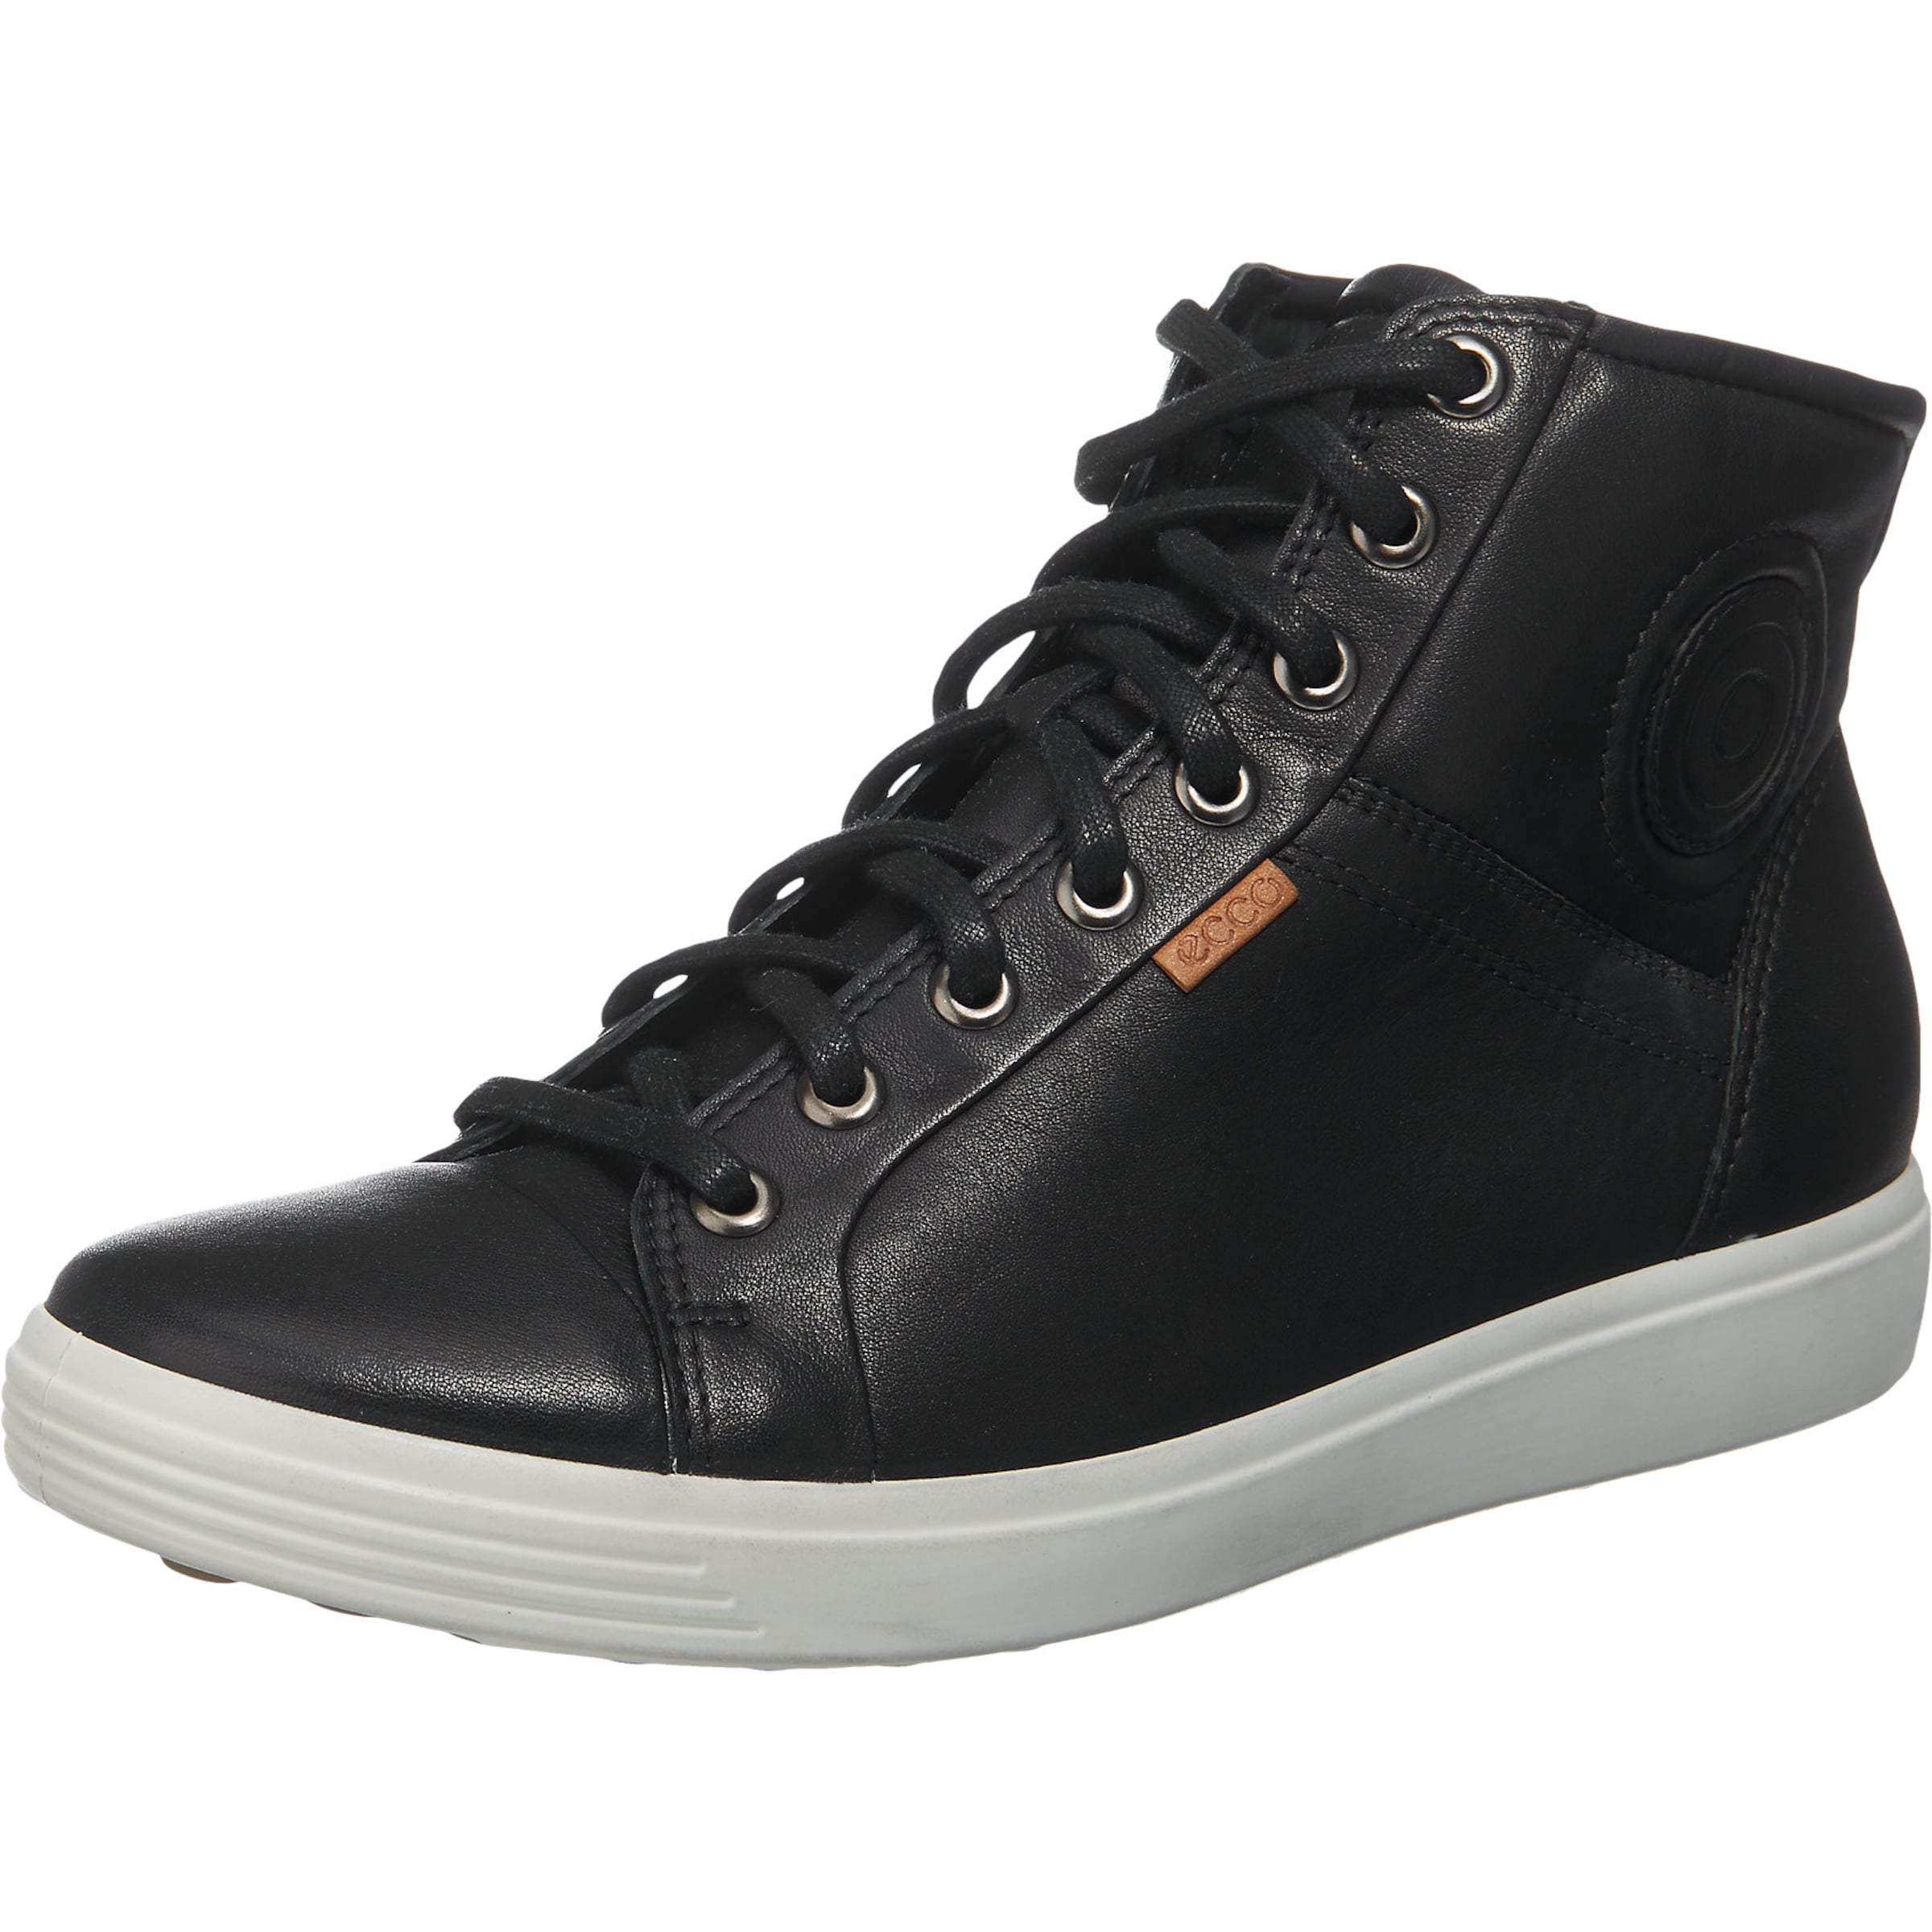 Haltbare Mode billige Schuhe ECCO   Soft 7 Sneakers Schuhe Gut getragene Schuhe